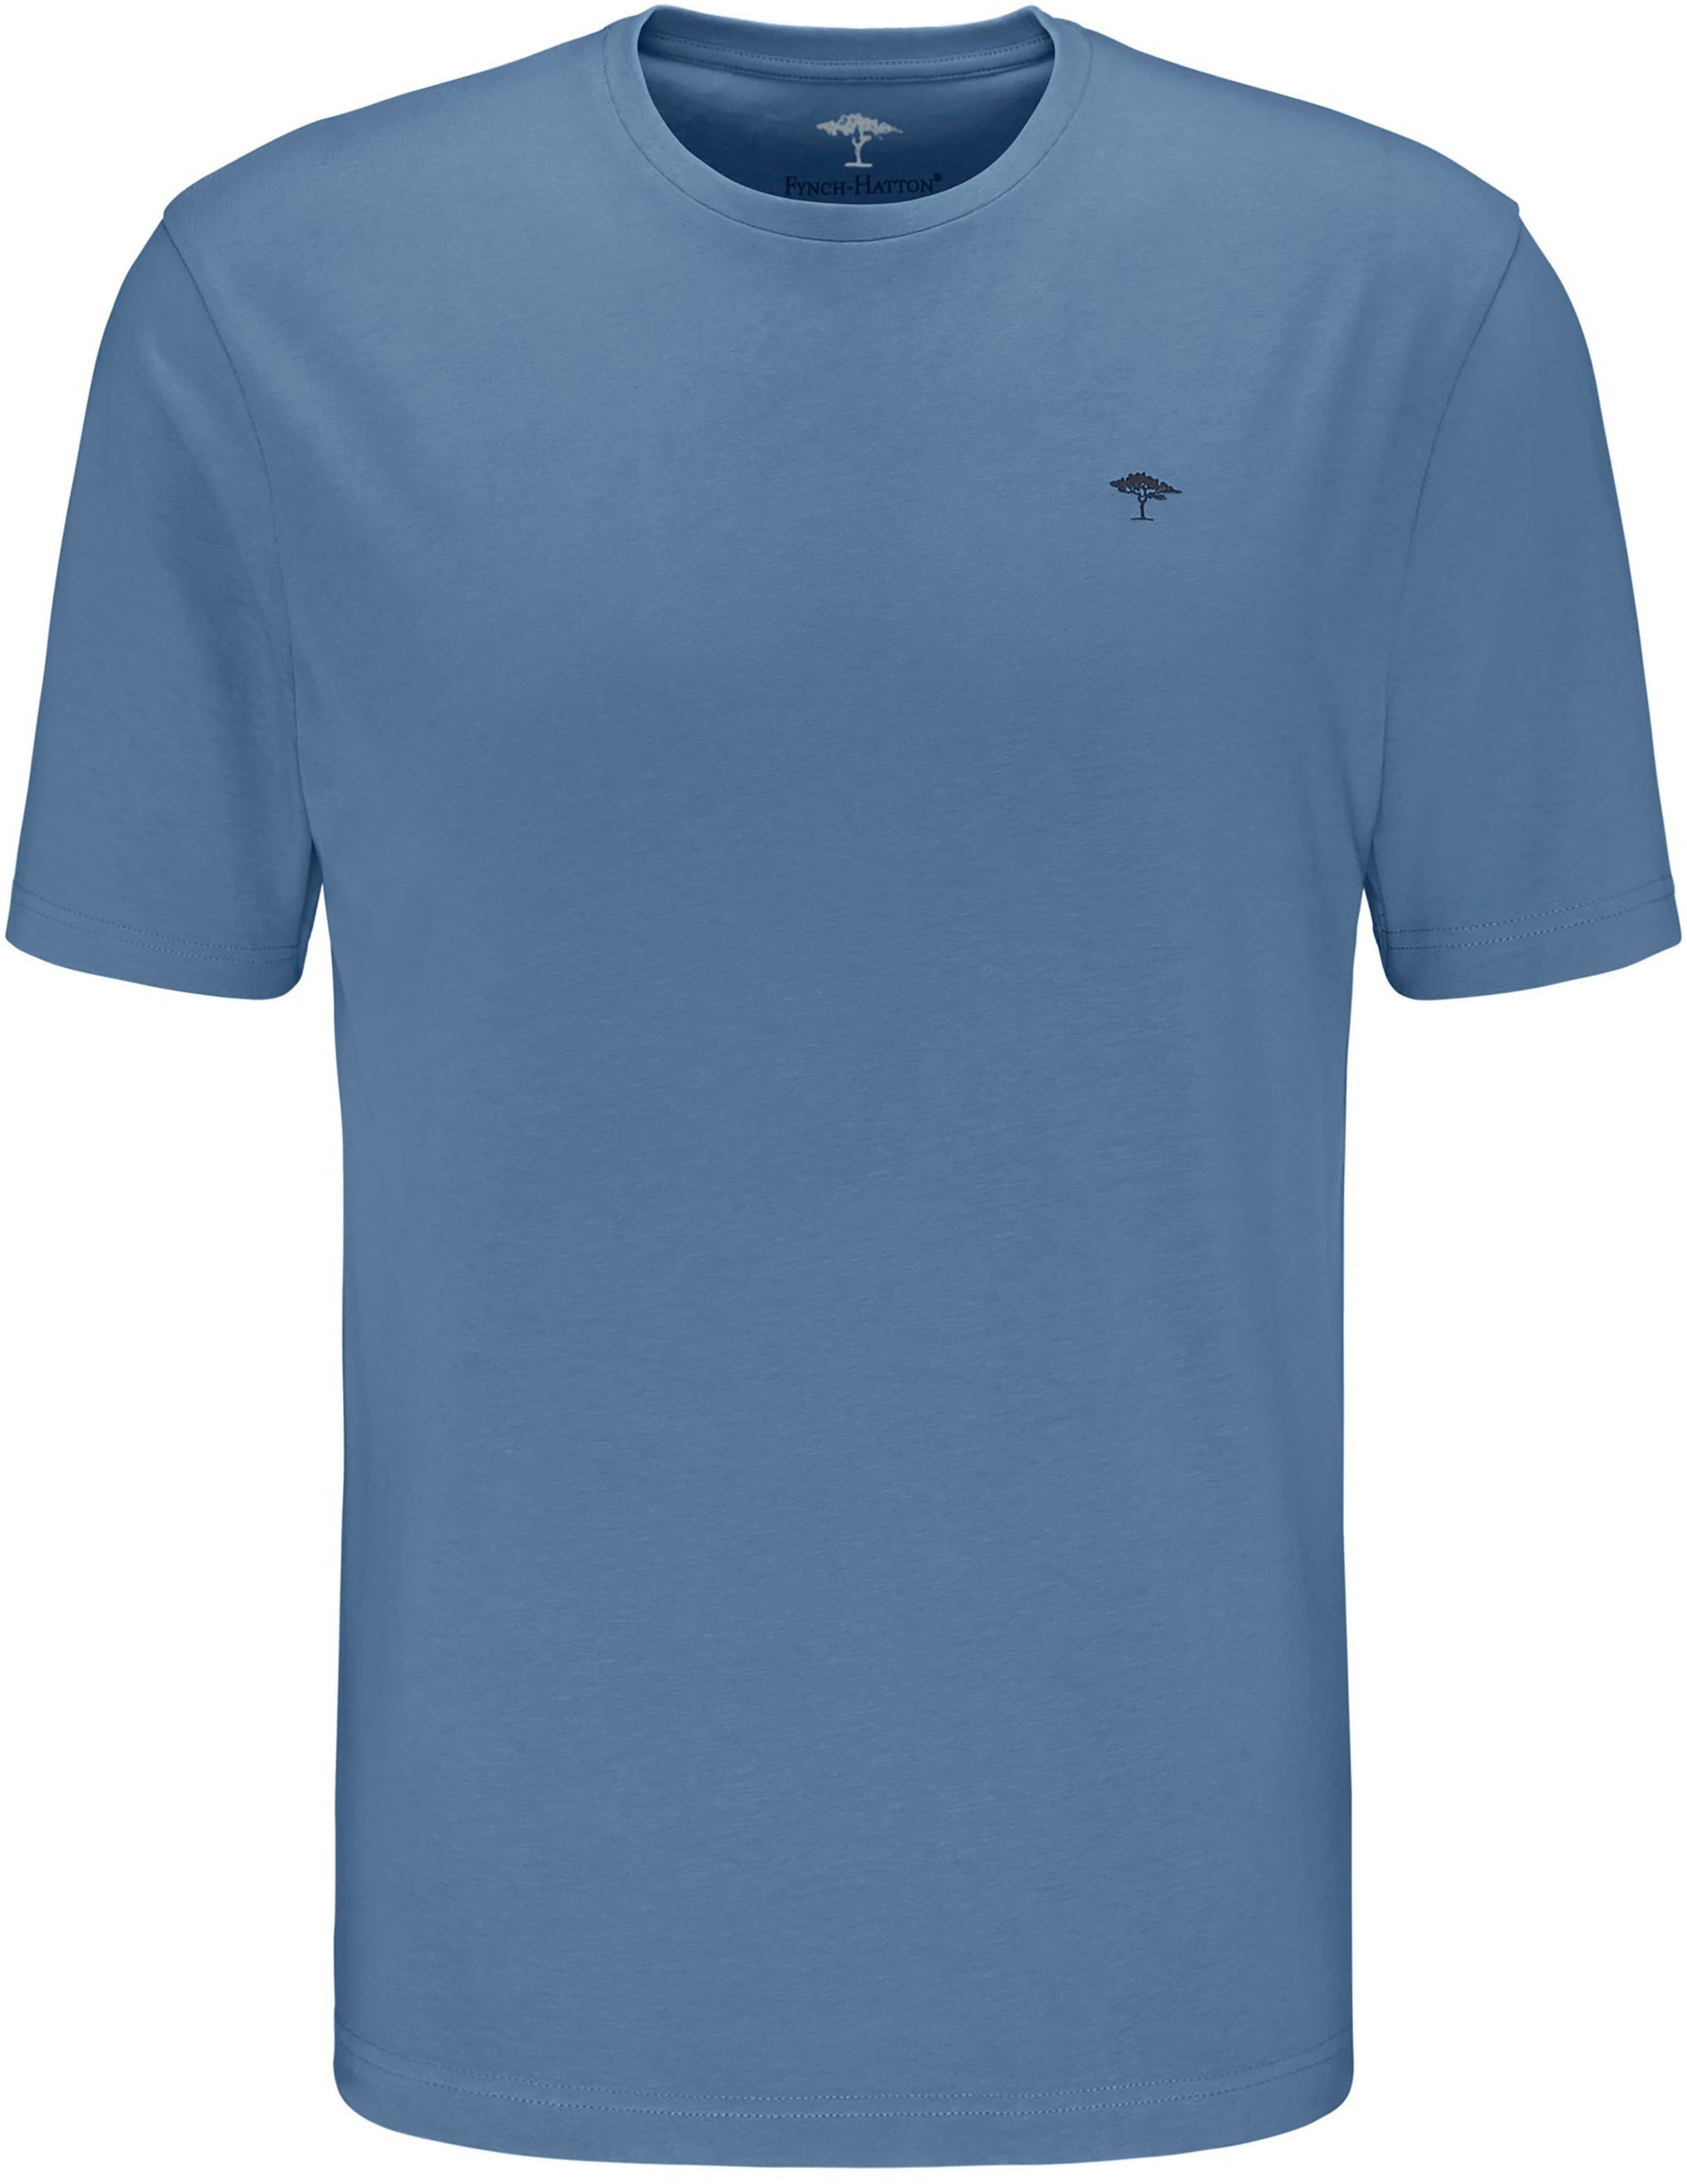 FYNCH-HATTON T-shirt unikleur bestellen: 30 dagen bedenktijd